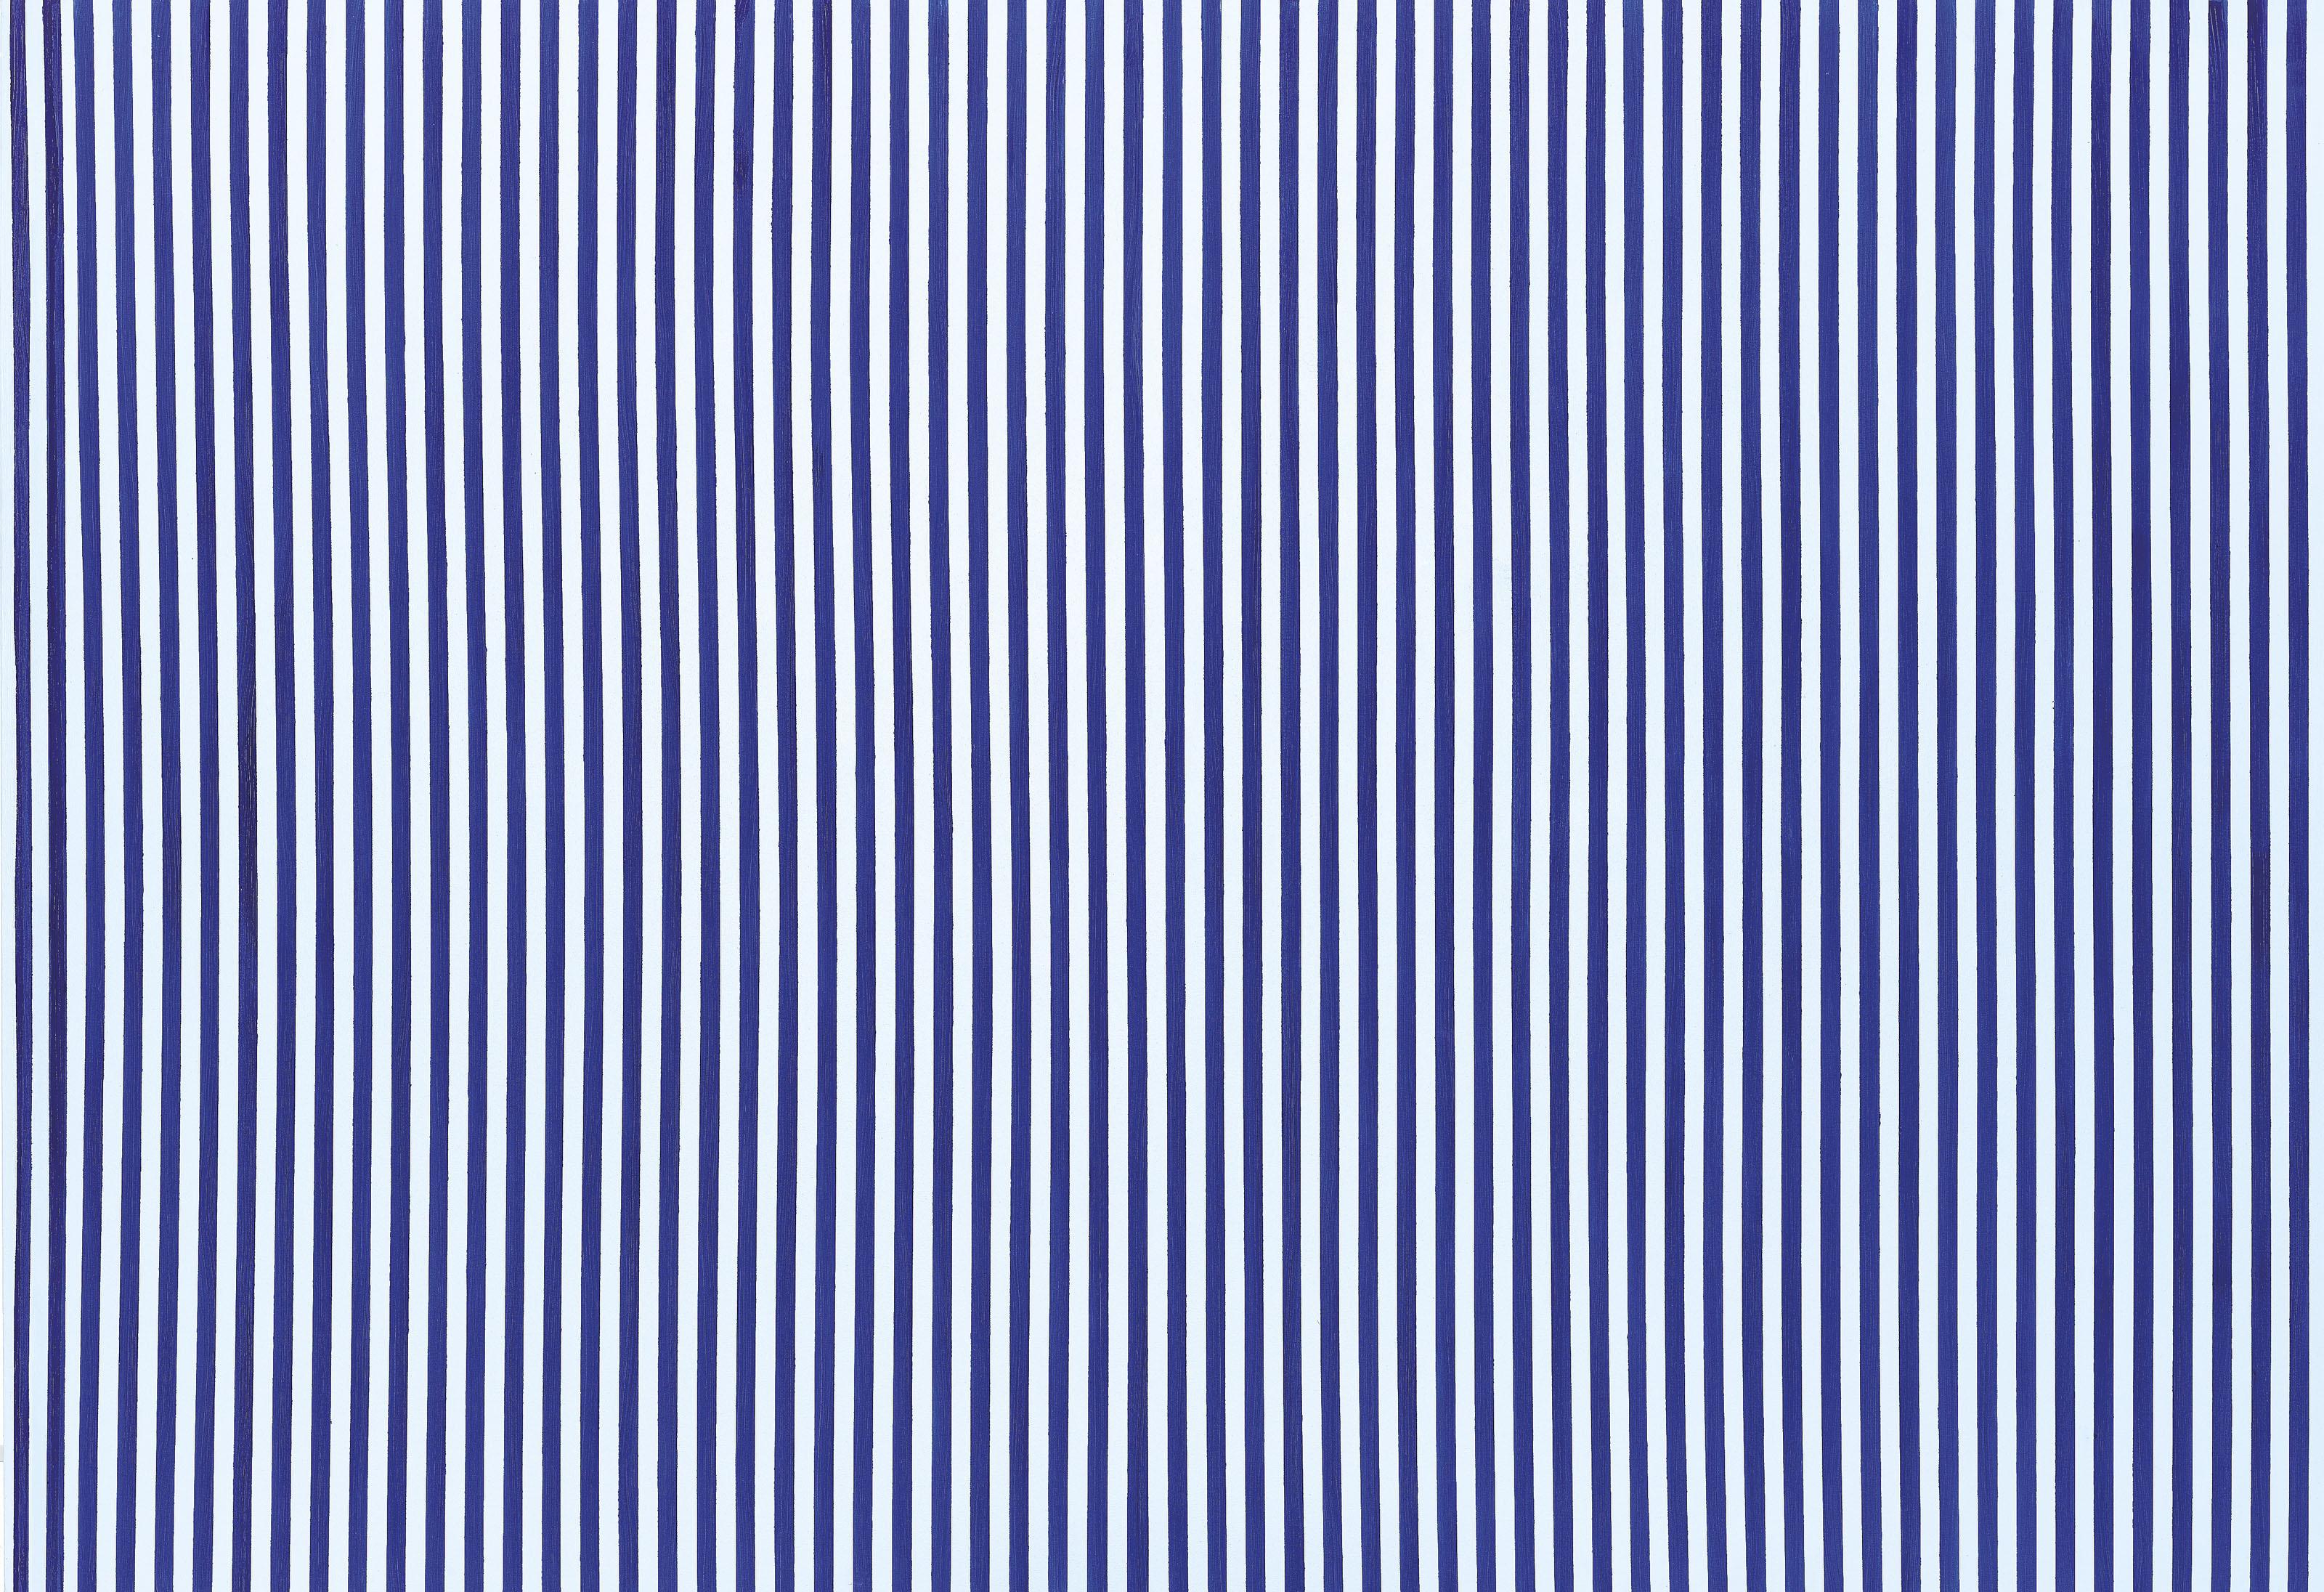 Untitled (Blue strips), 1989